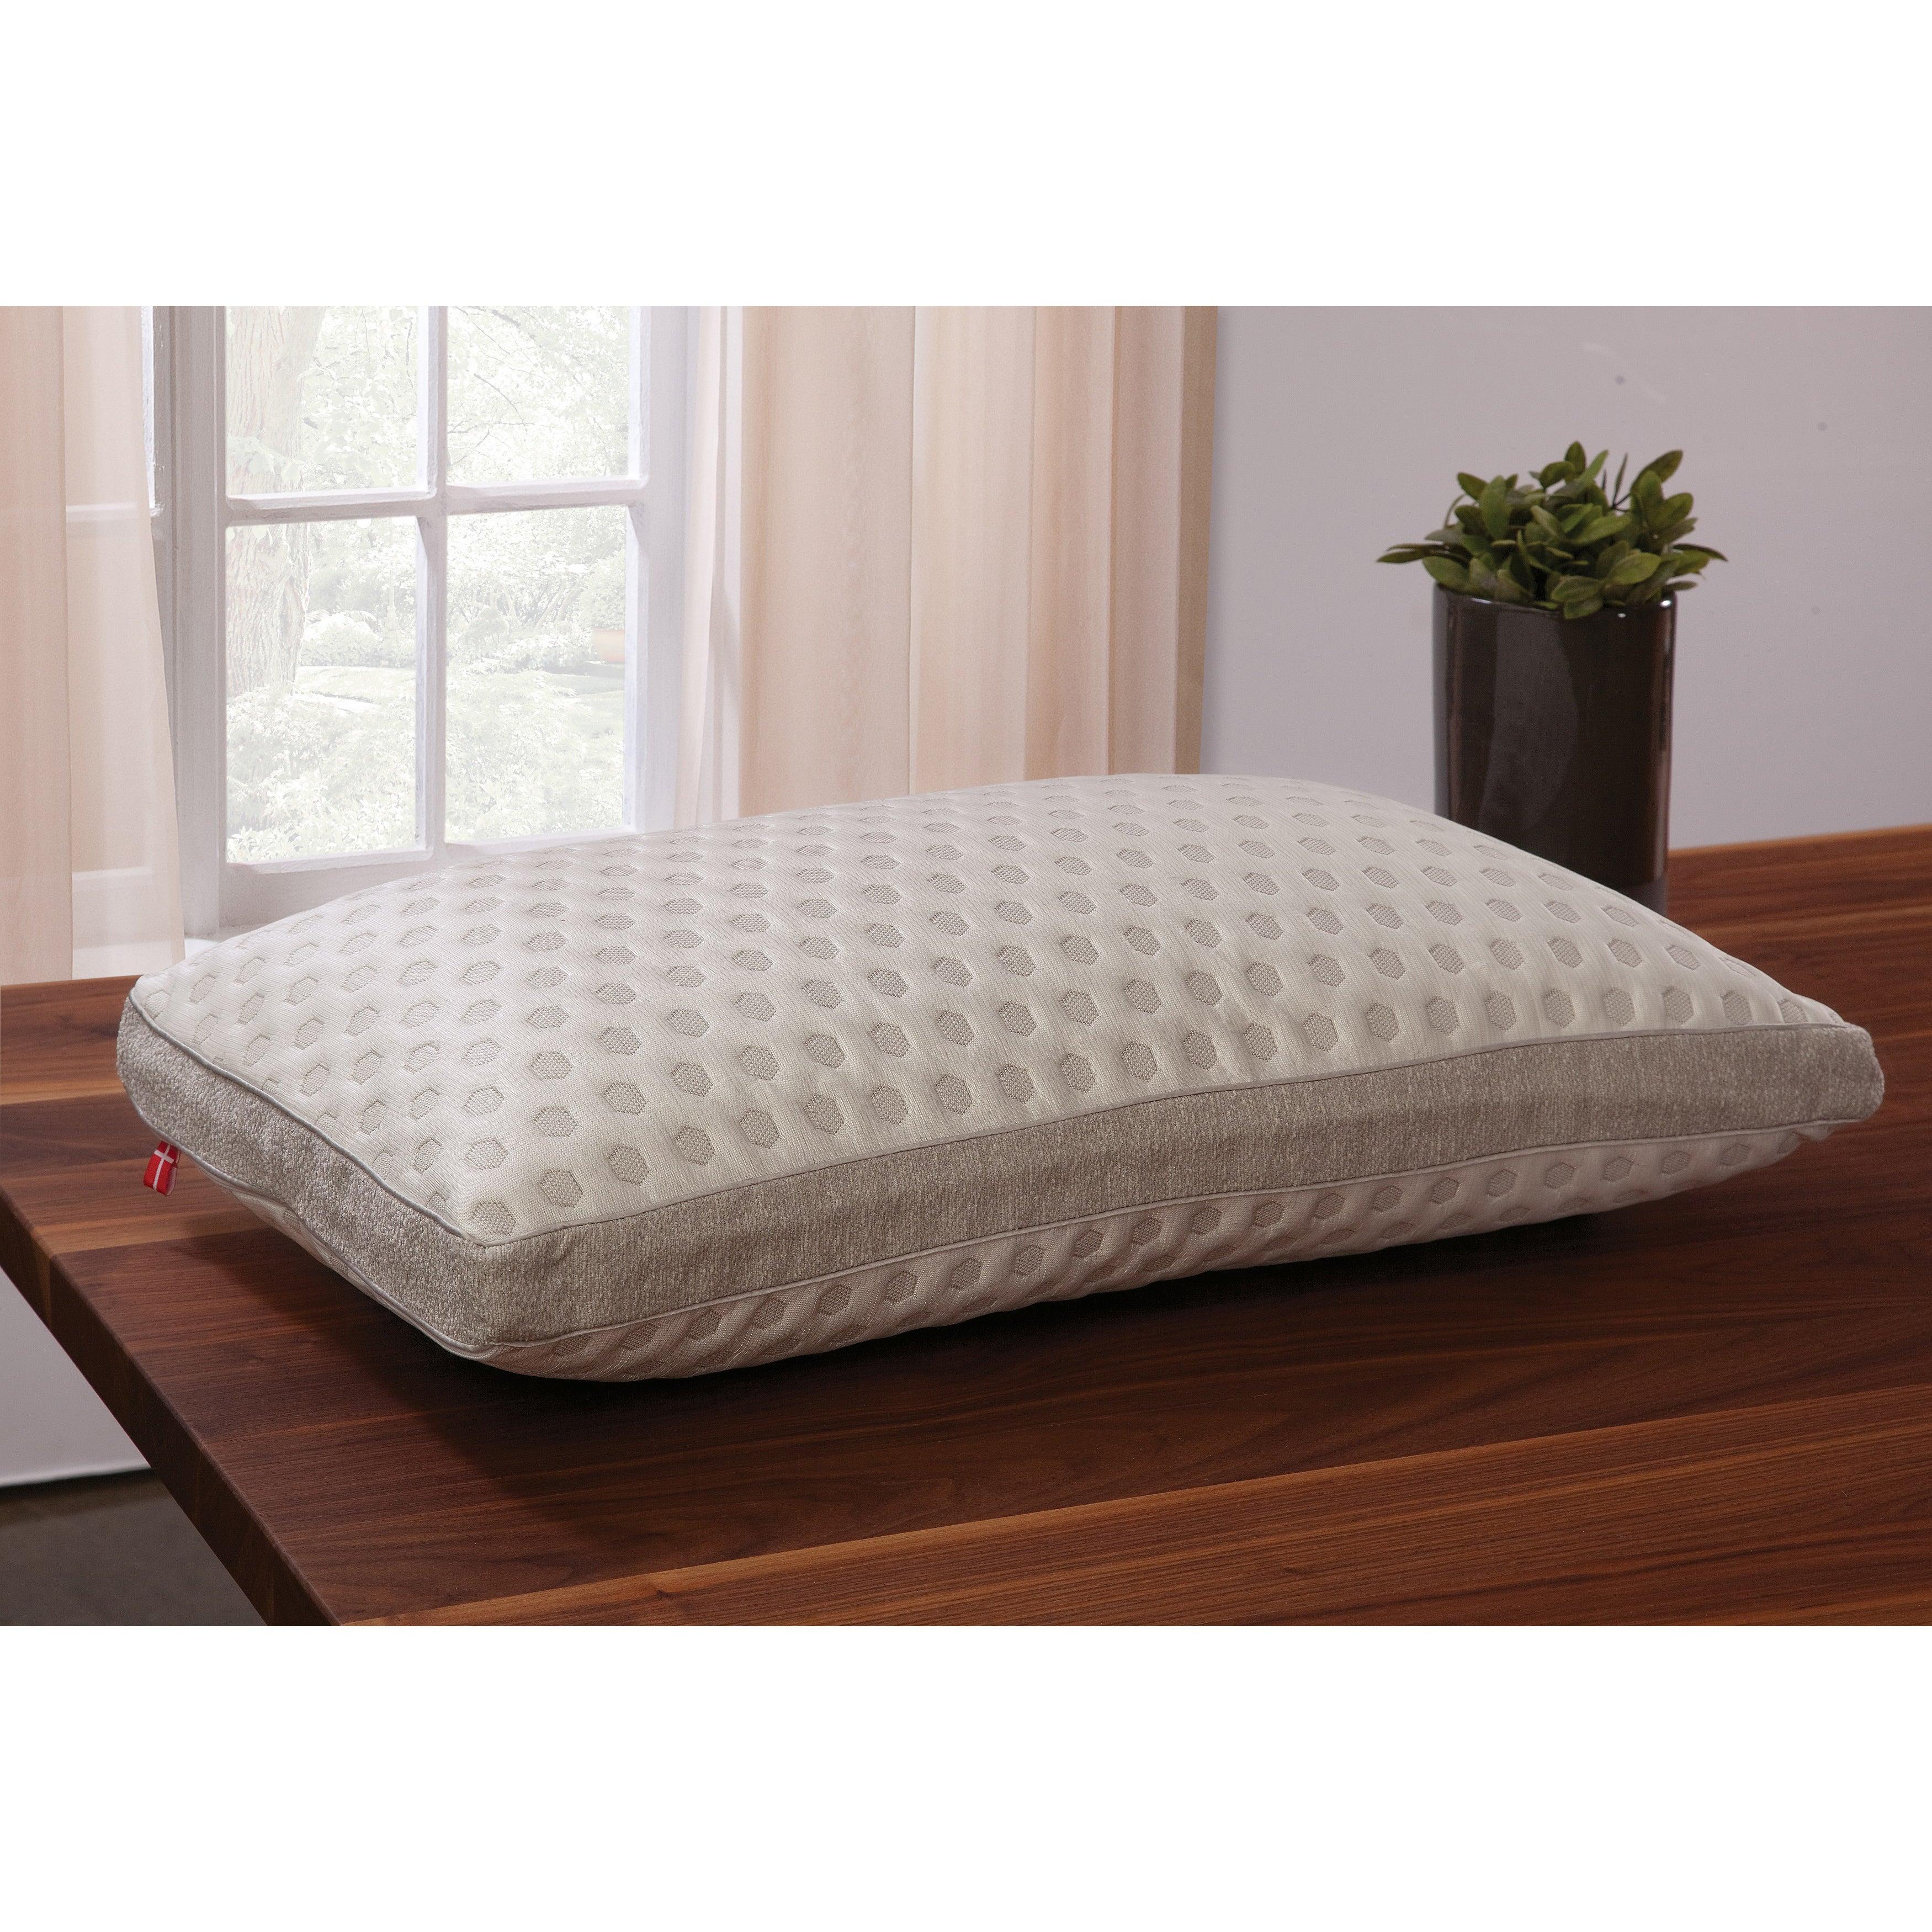 Danican Cool Pointe Teneritas Pillow (Queen), White